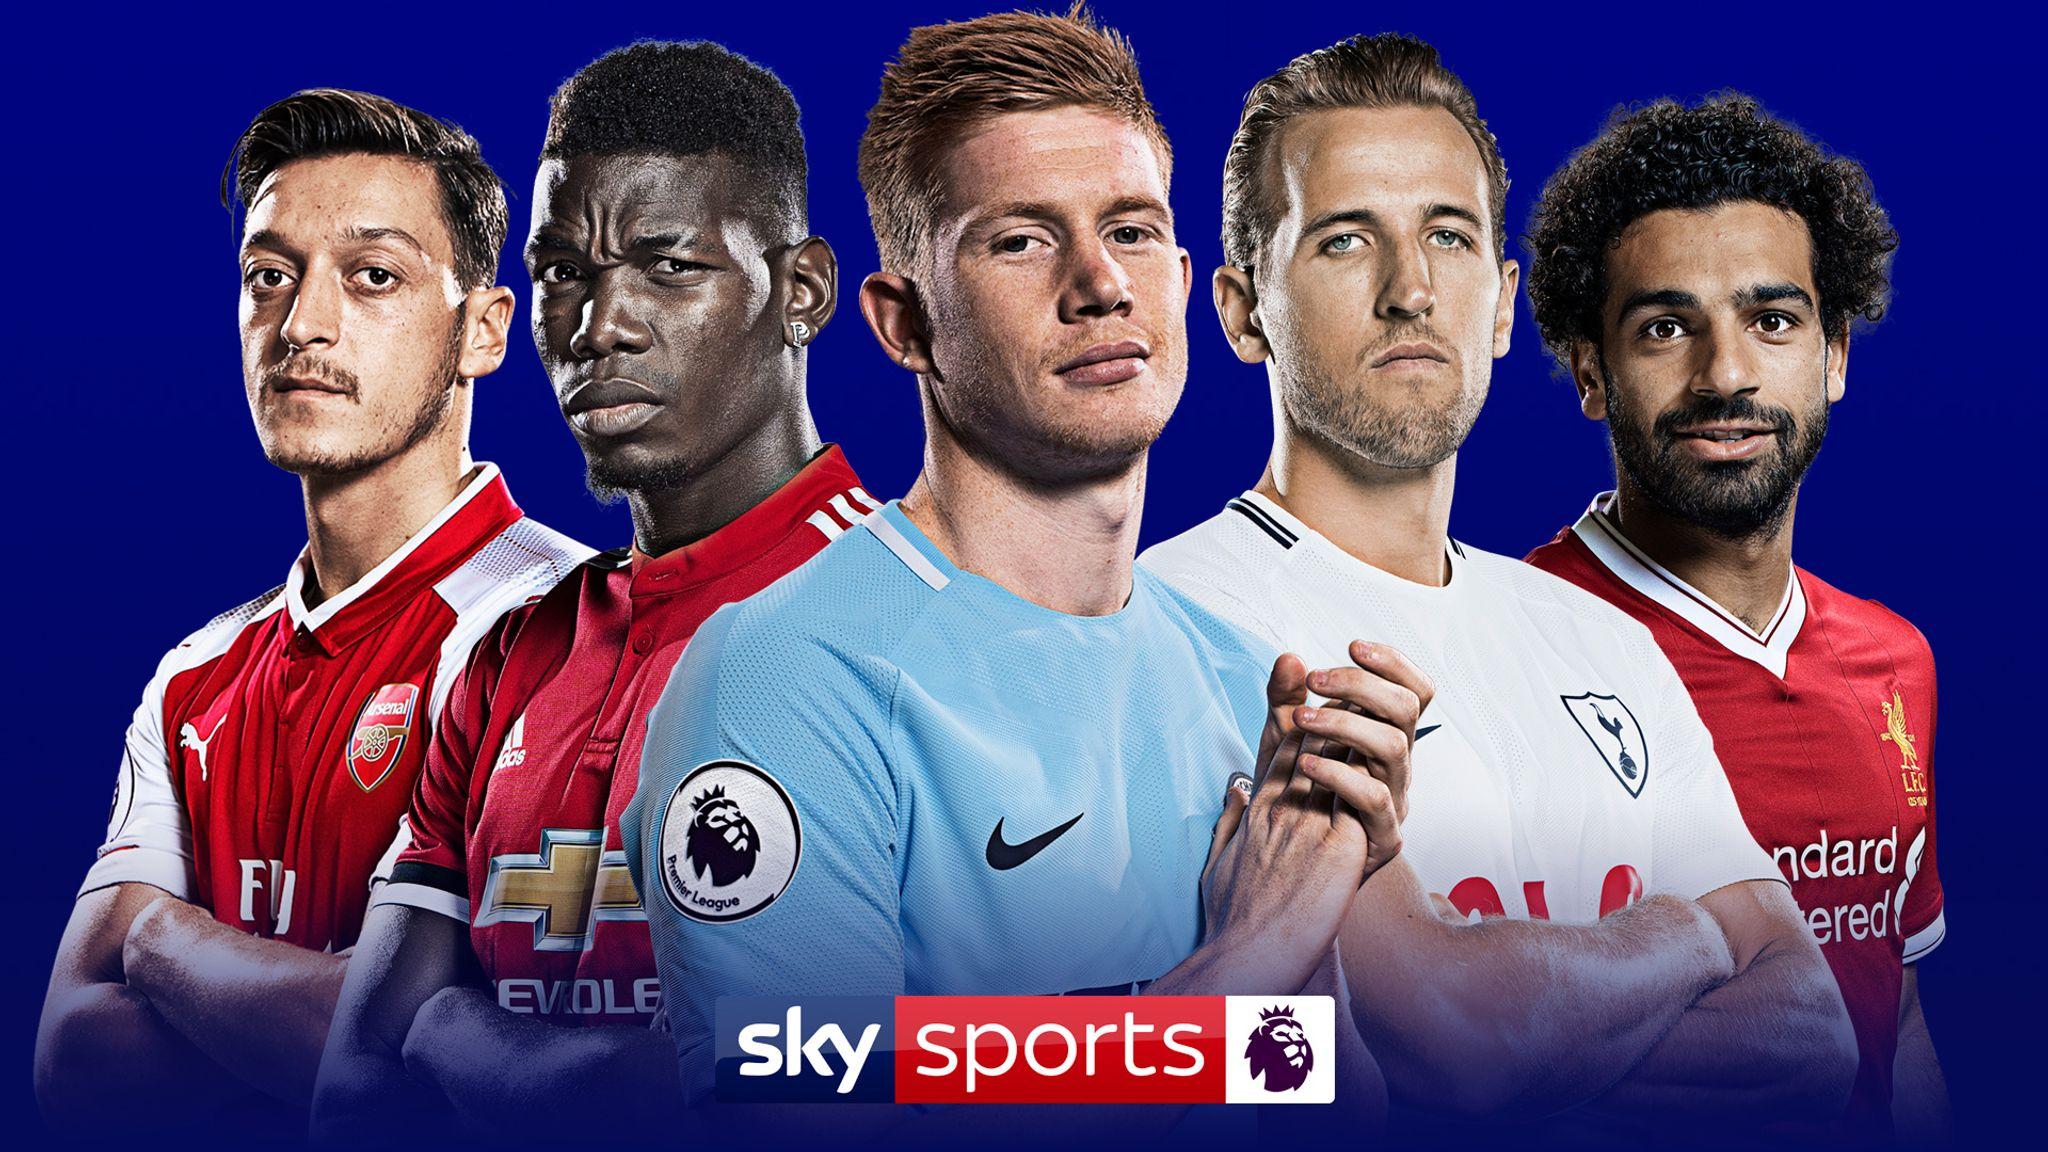 Premier League takes major step towards restart of season